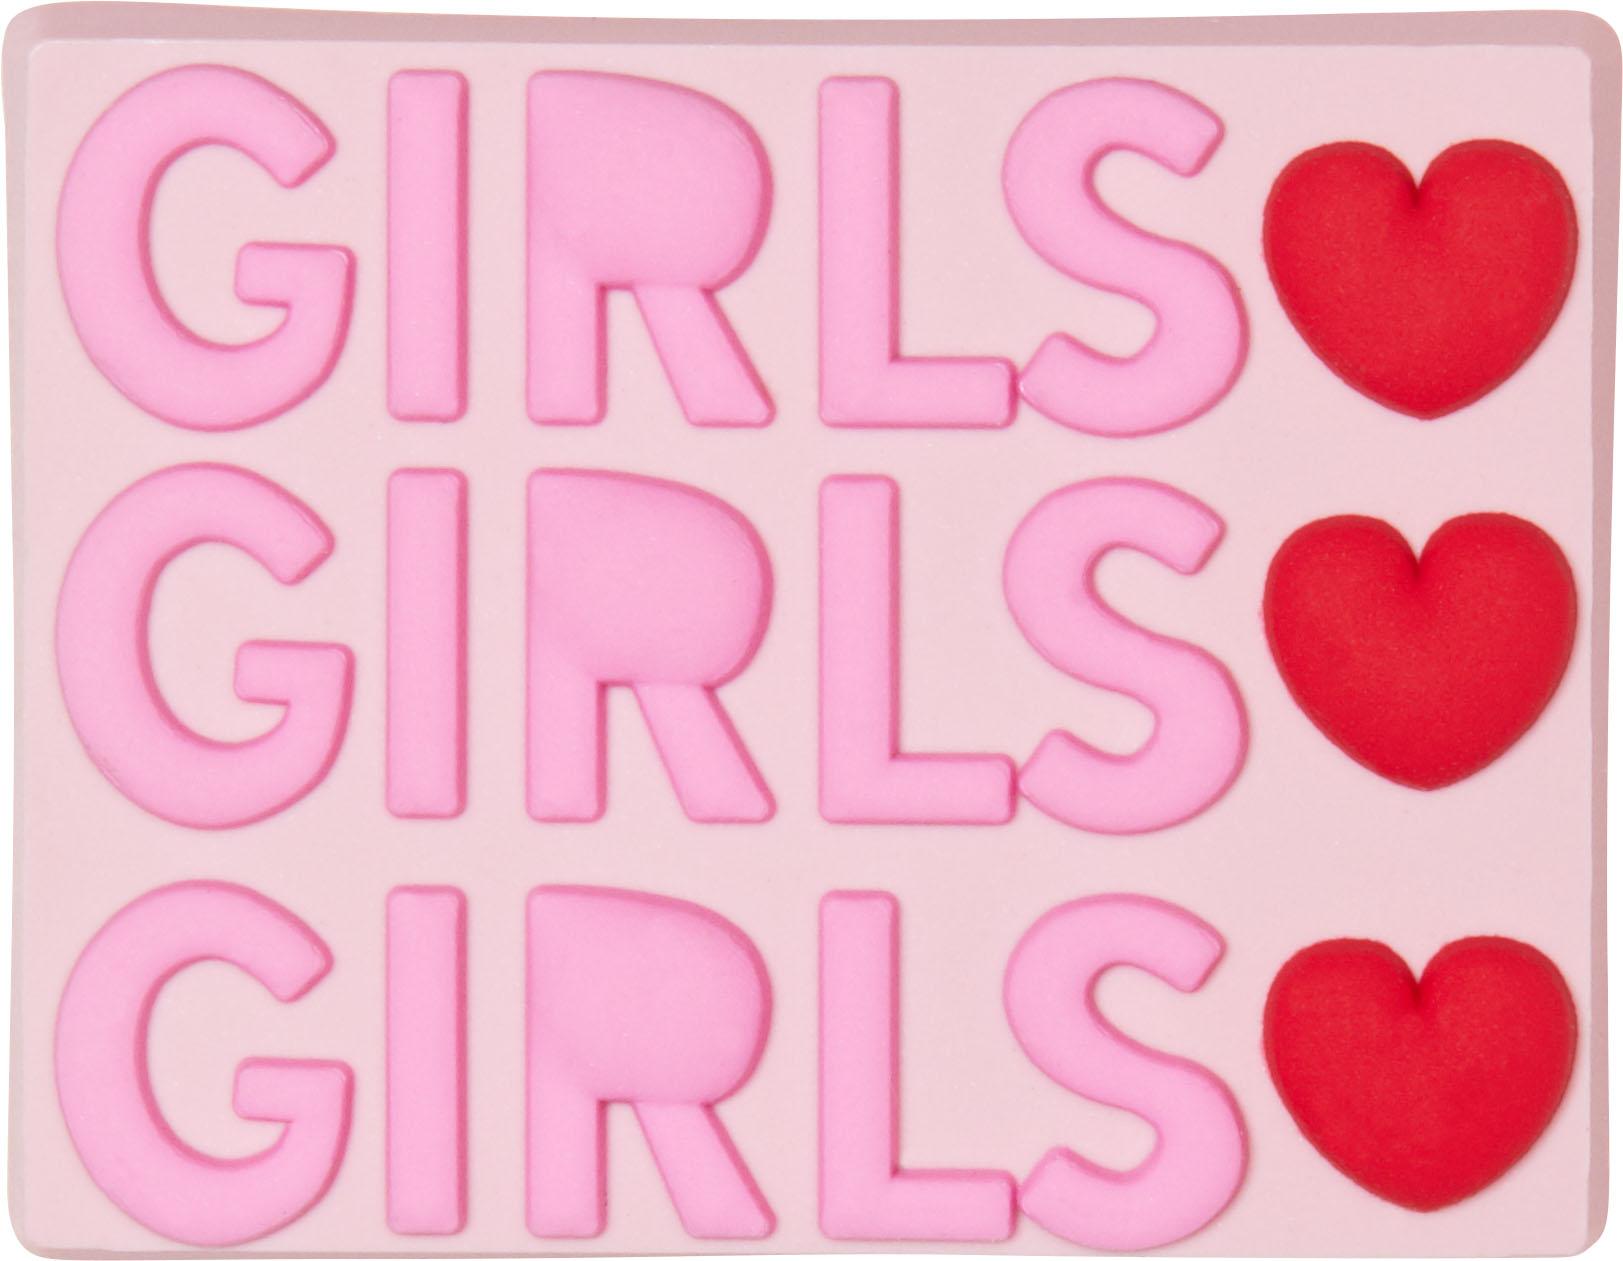 Crocs™ Crocs GIRLS GIRLS GIRLS G0702300-MU